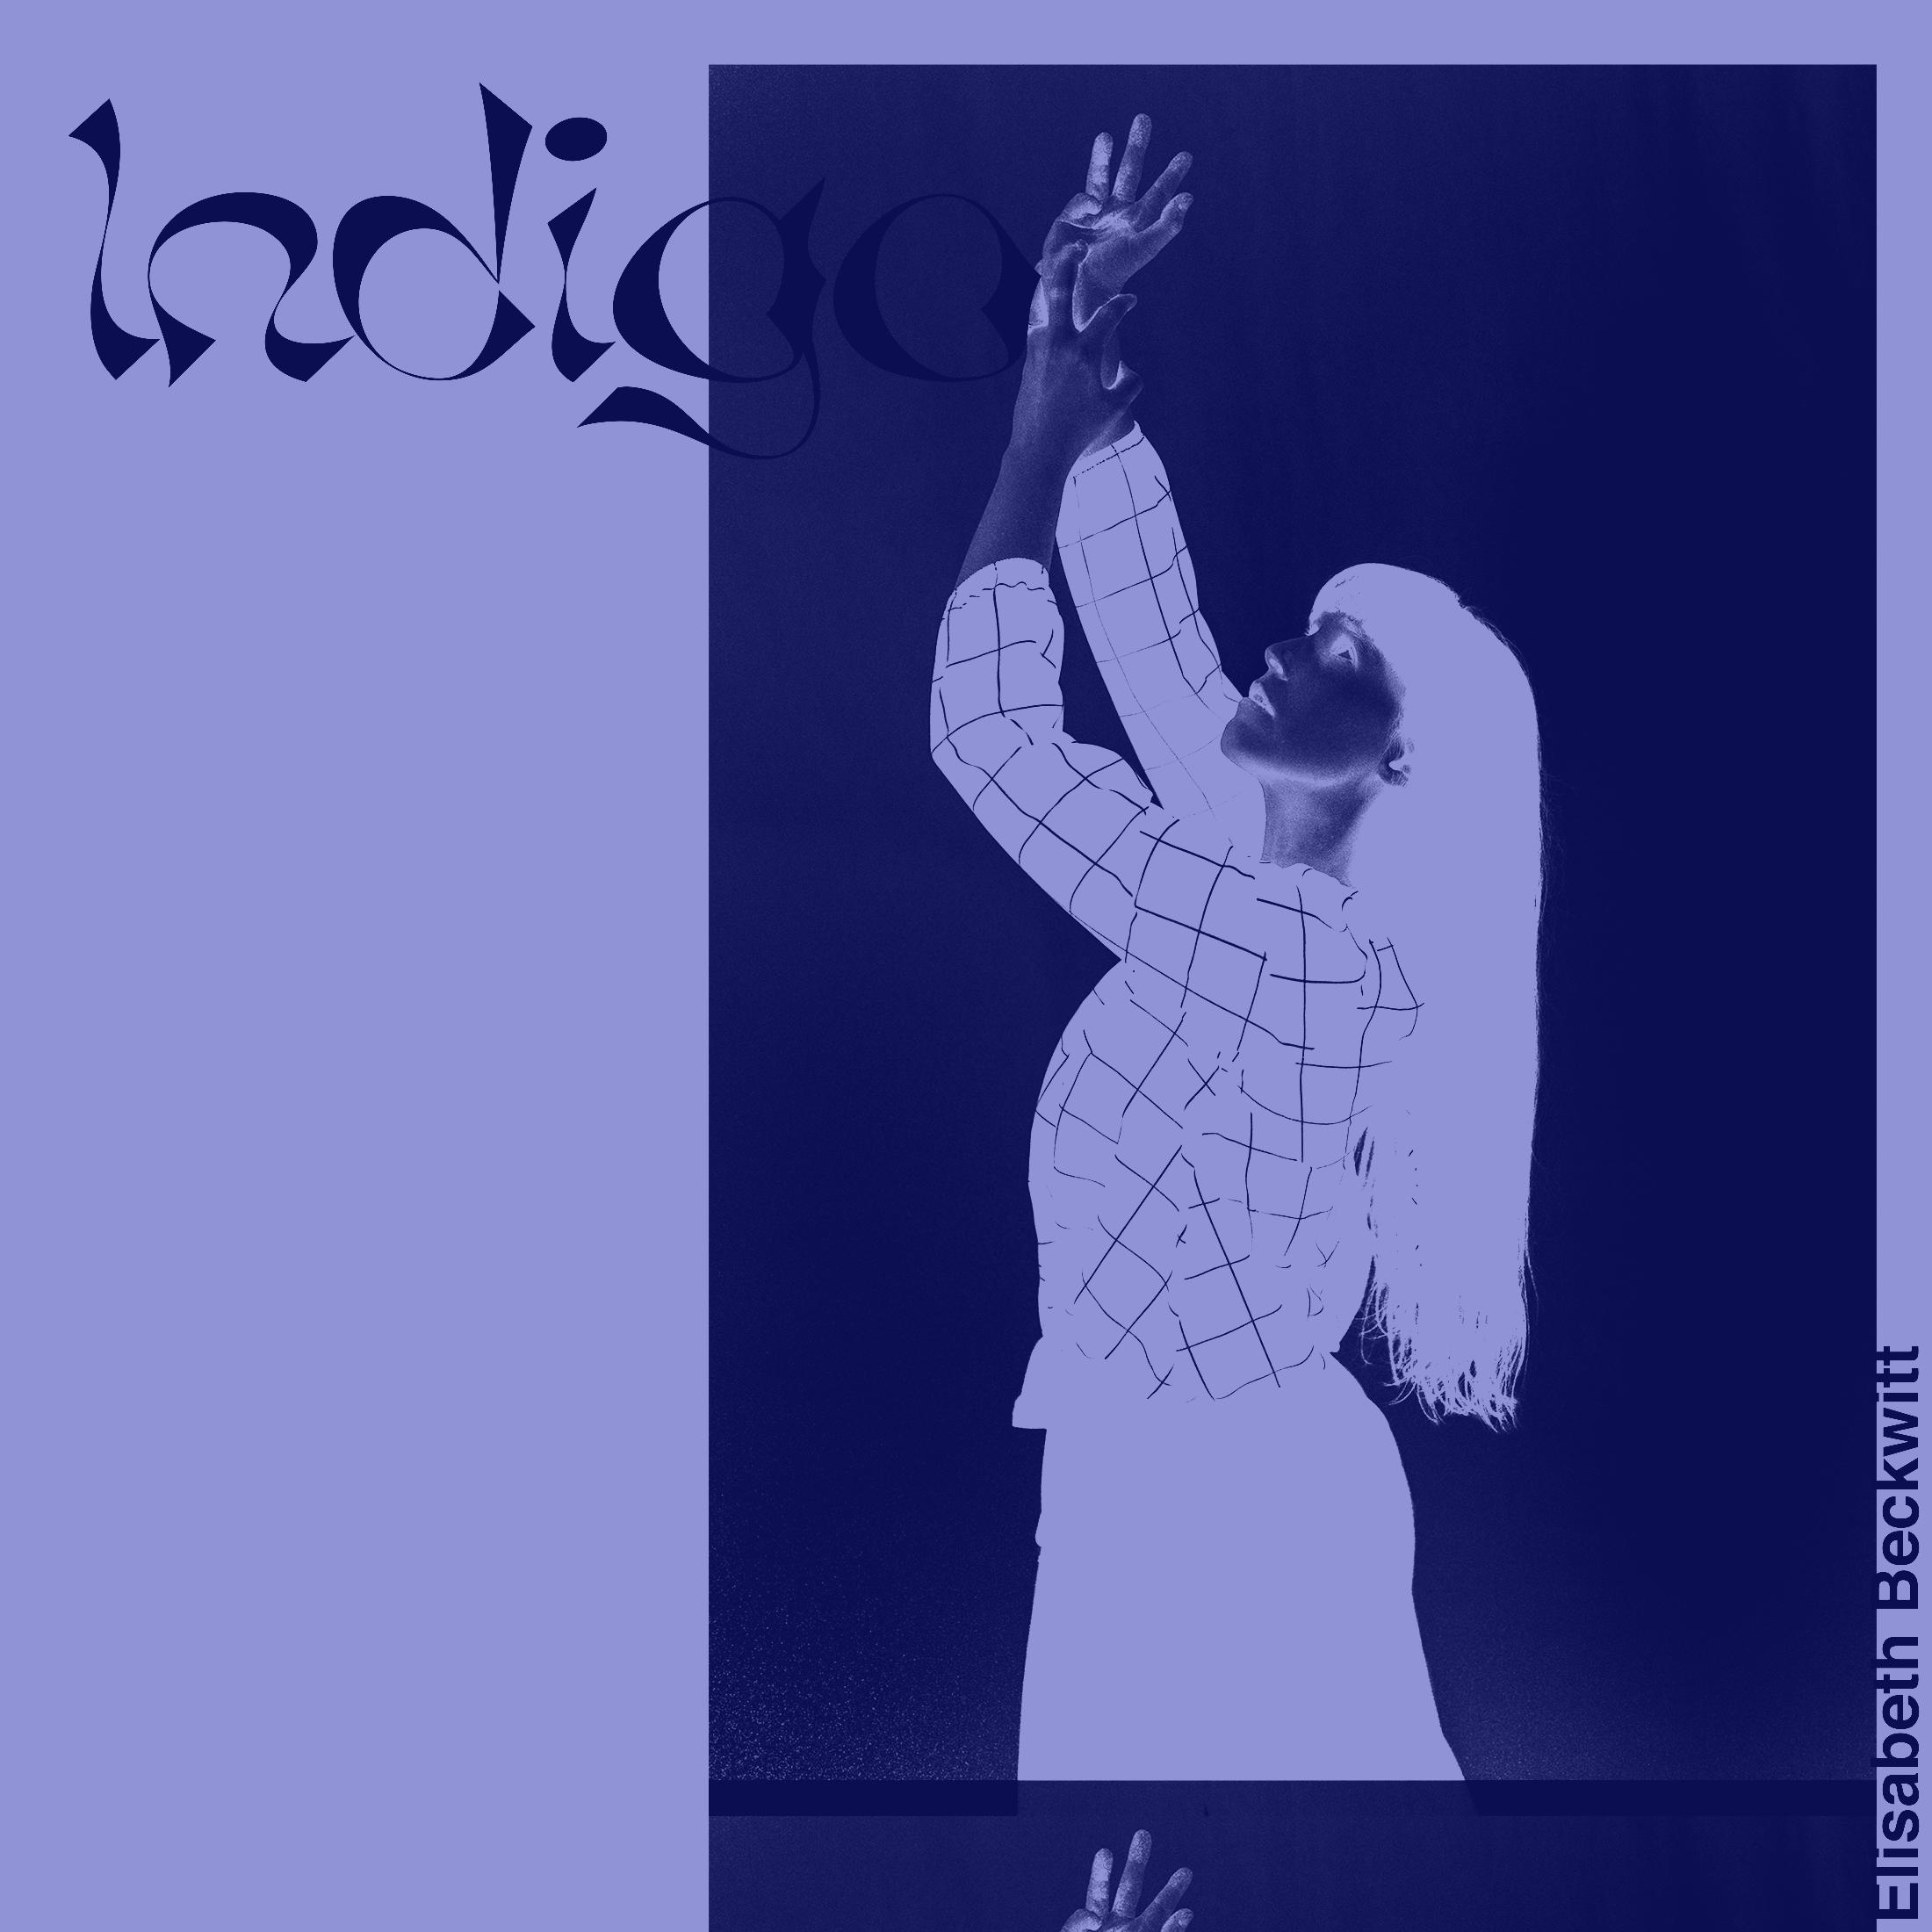 Indigo_FinalArtwork.png